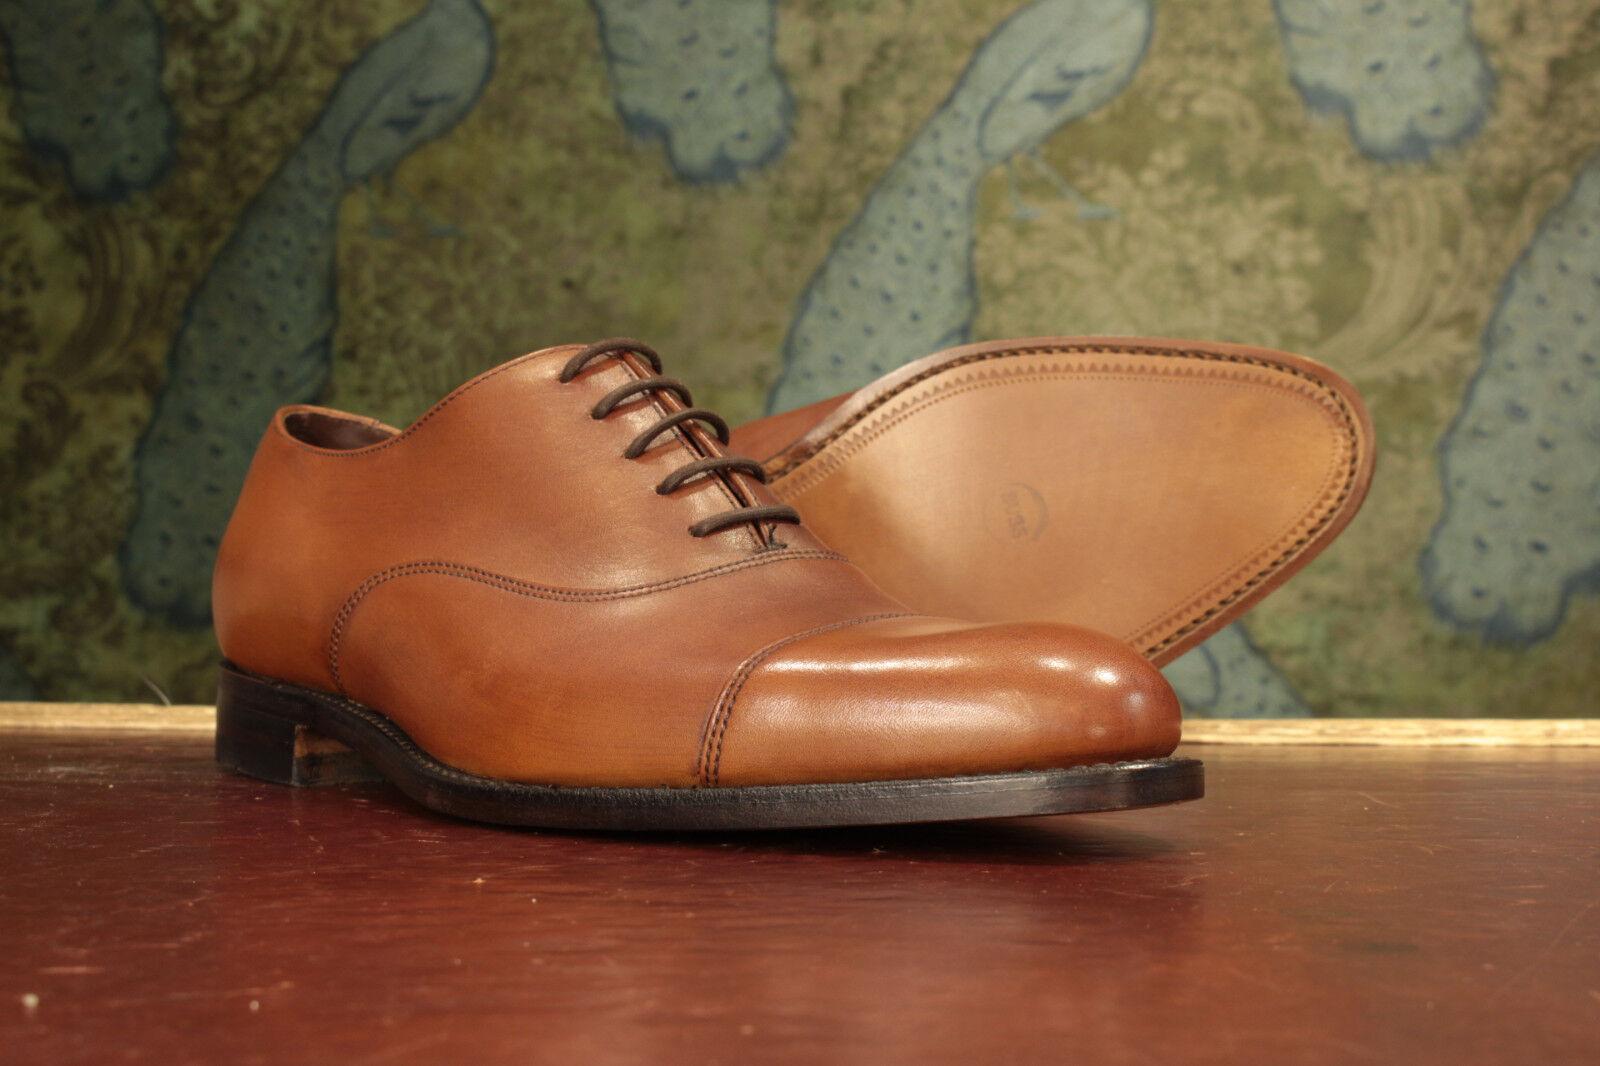 Loake Holborn Mahogany Oxford Schuhes 9G - NEU Seconds RRP £200 (16642)